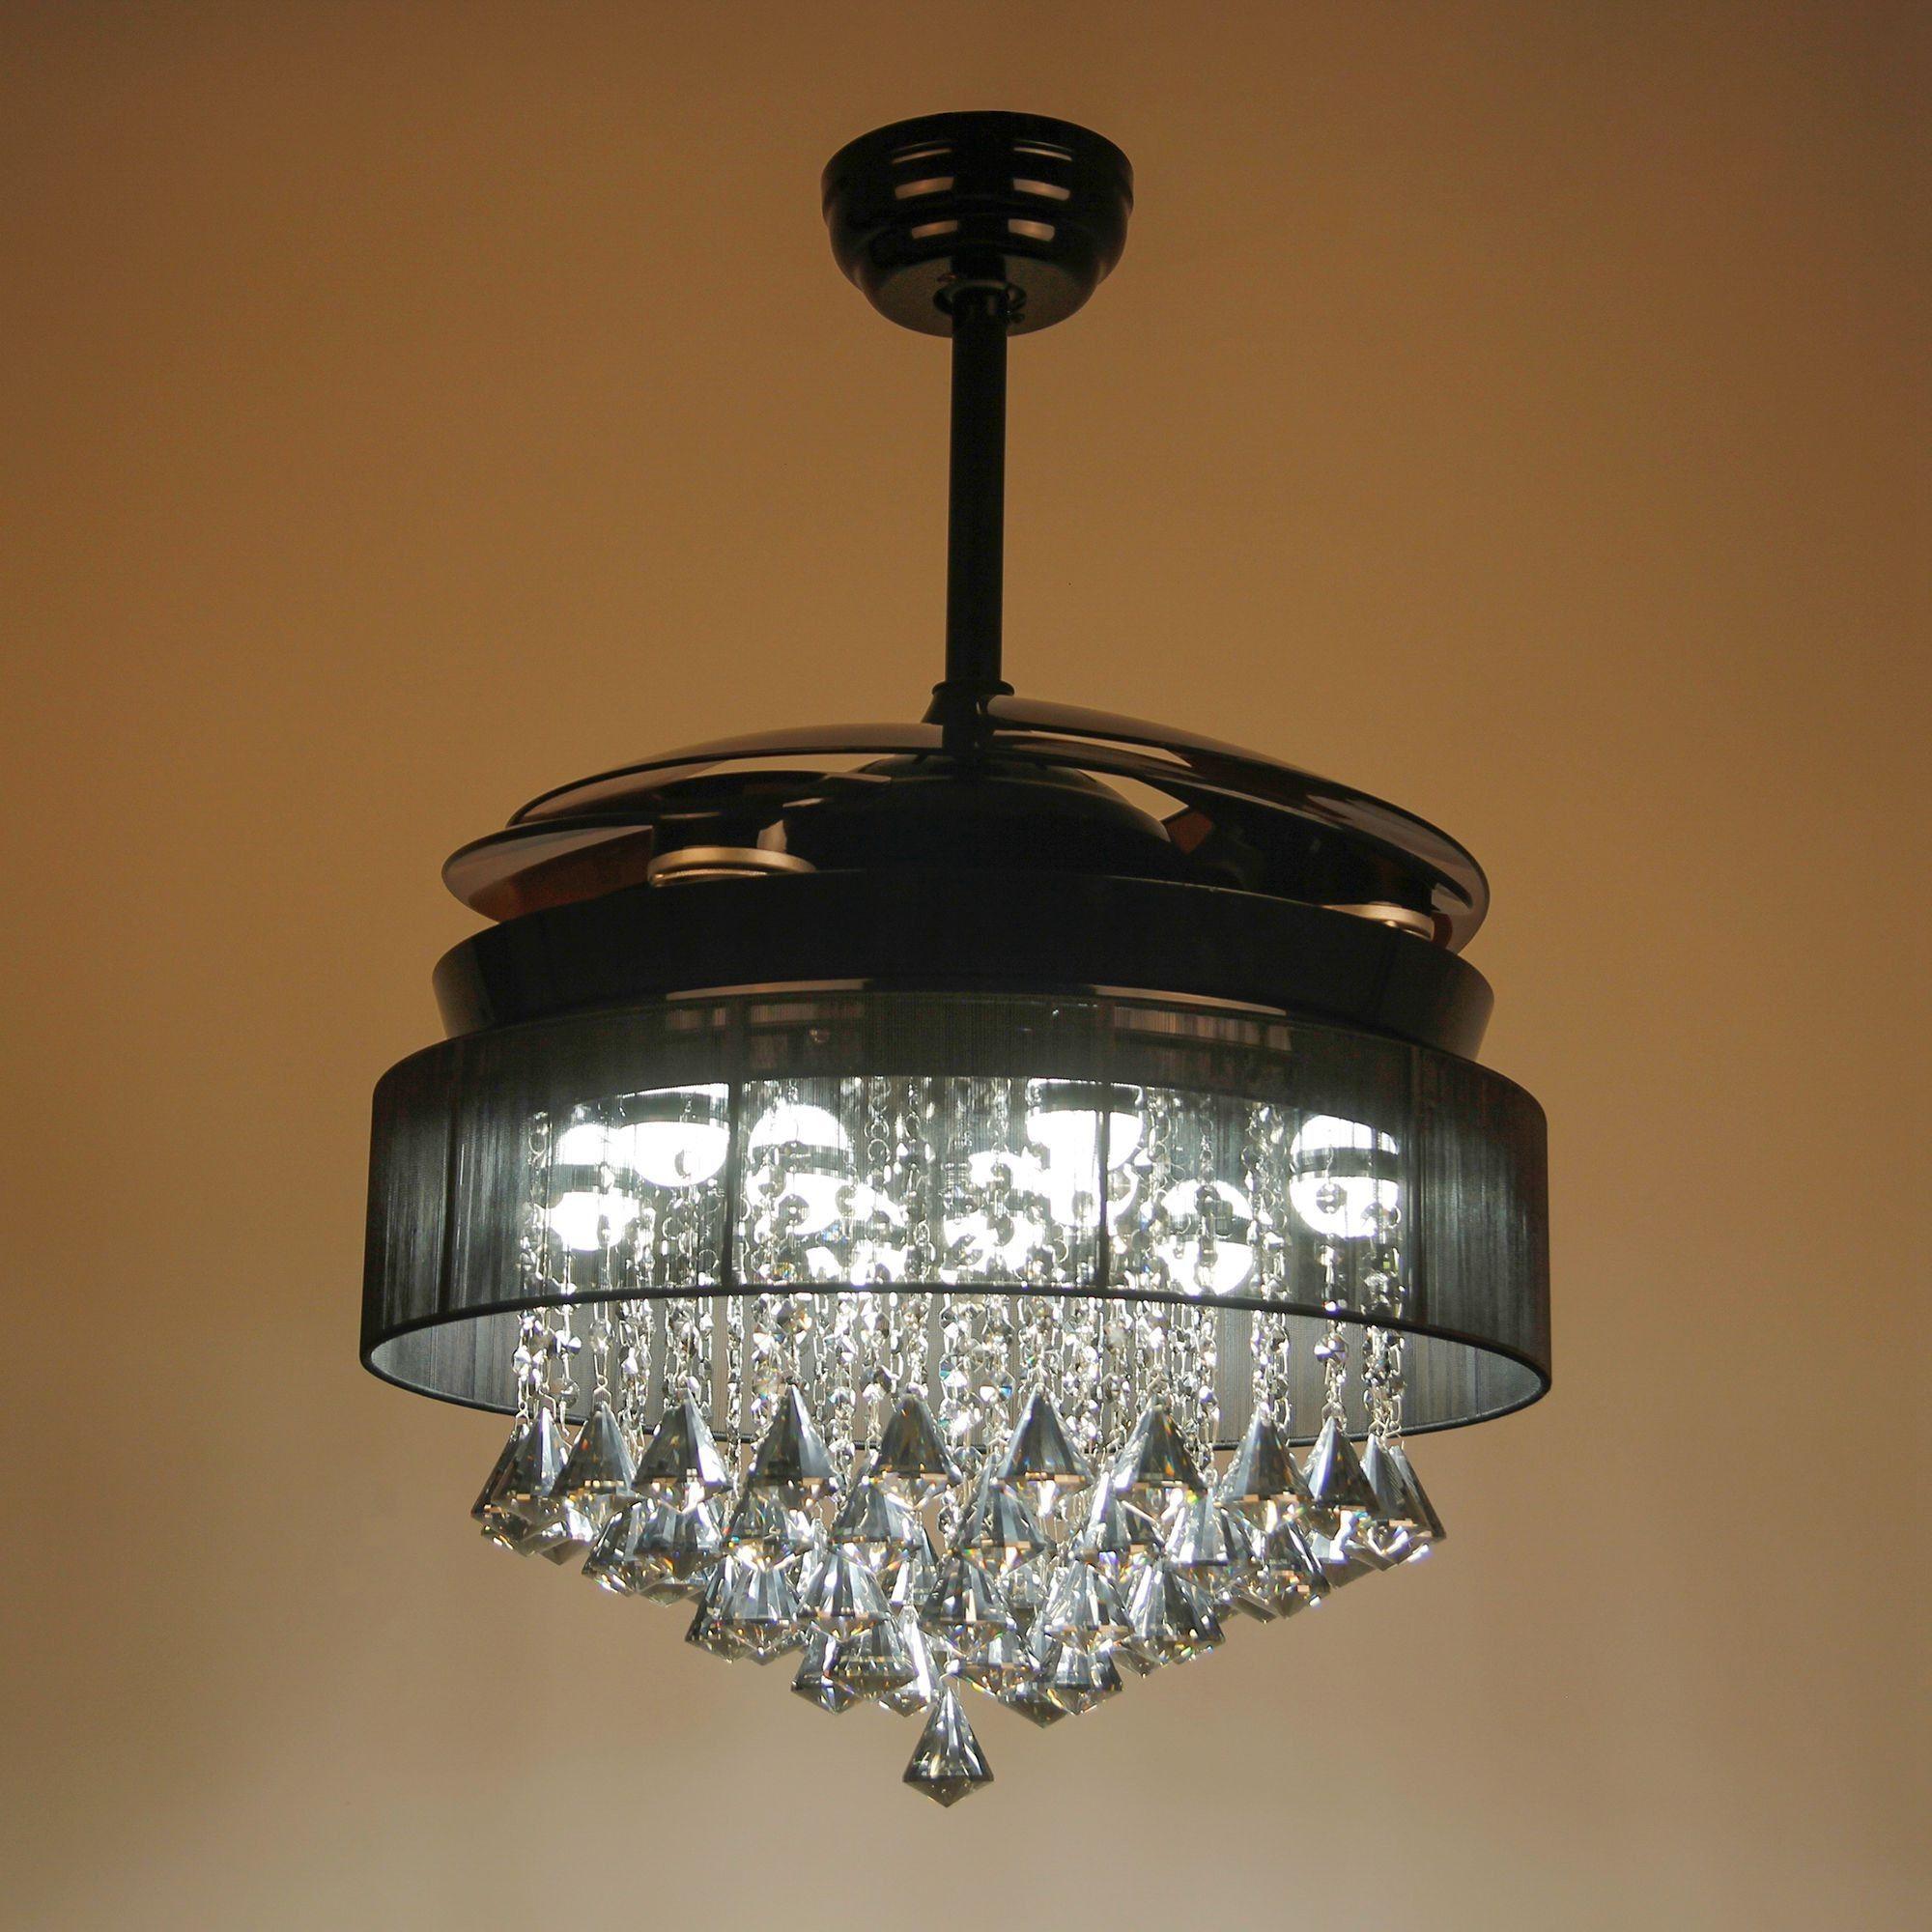 46 Broxburne Ventilateur De Plafond Avec Lumieres Led Ventilateur De Lustre En Cristal Moderne P In 2020 Chandelier Fan Modern Crystal Chandelier Ceiling Fan Shades